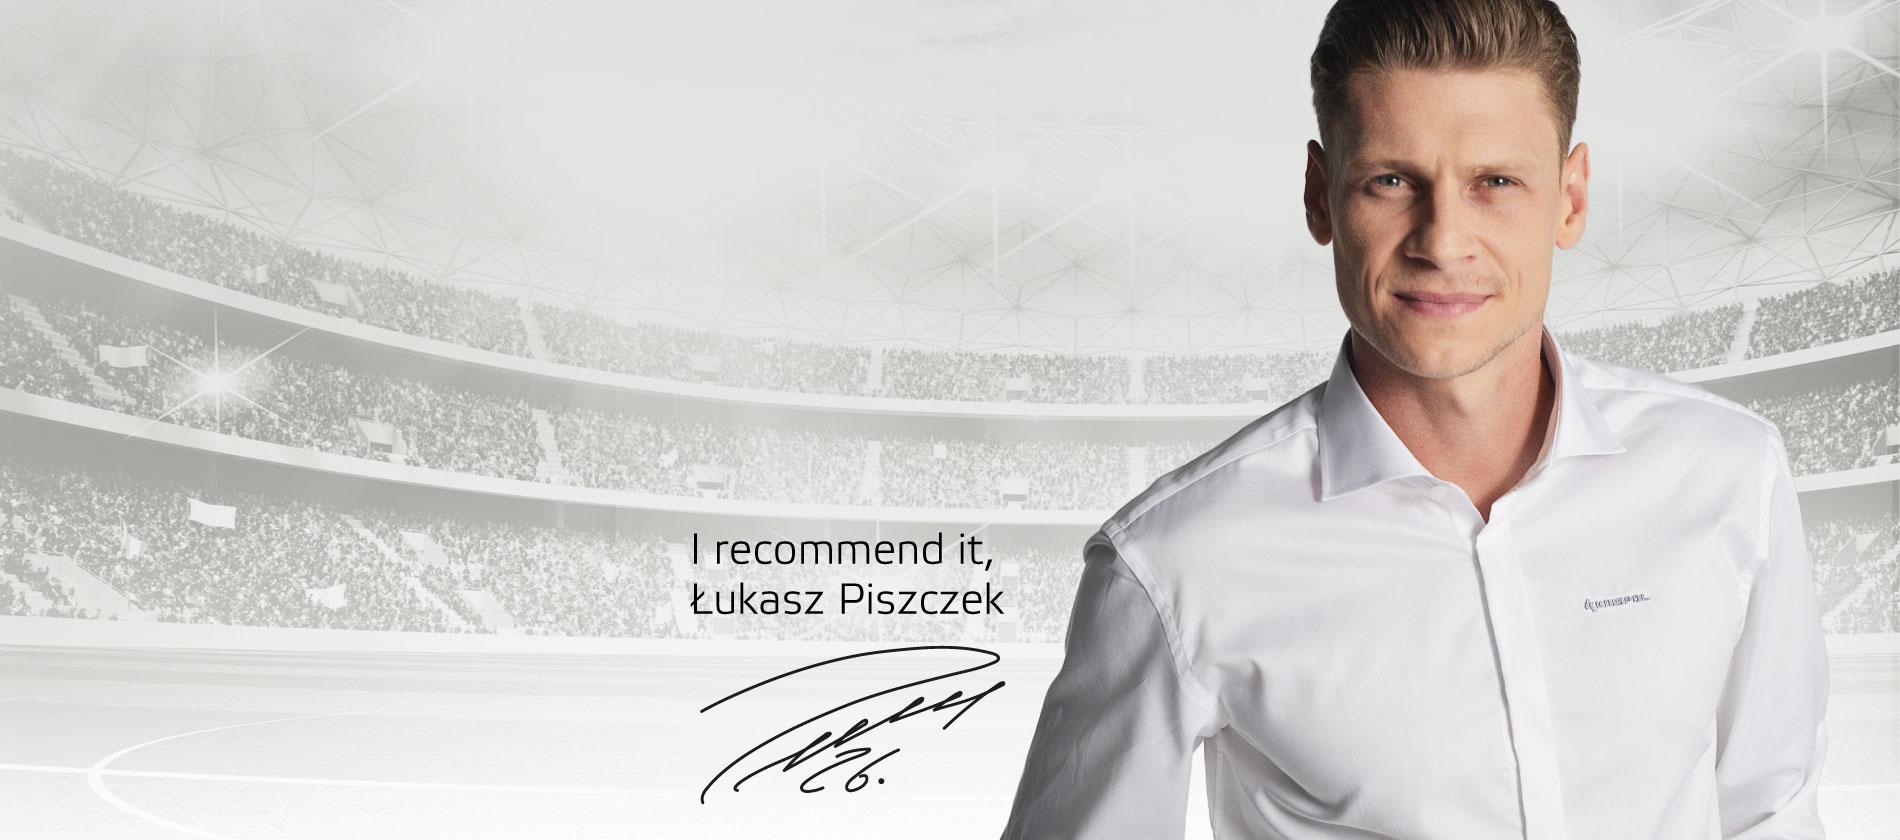 slider-lukasz-piszczek-ambasador-krispol-EN